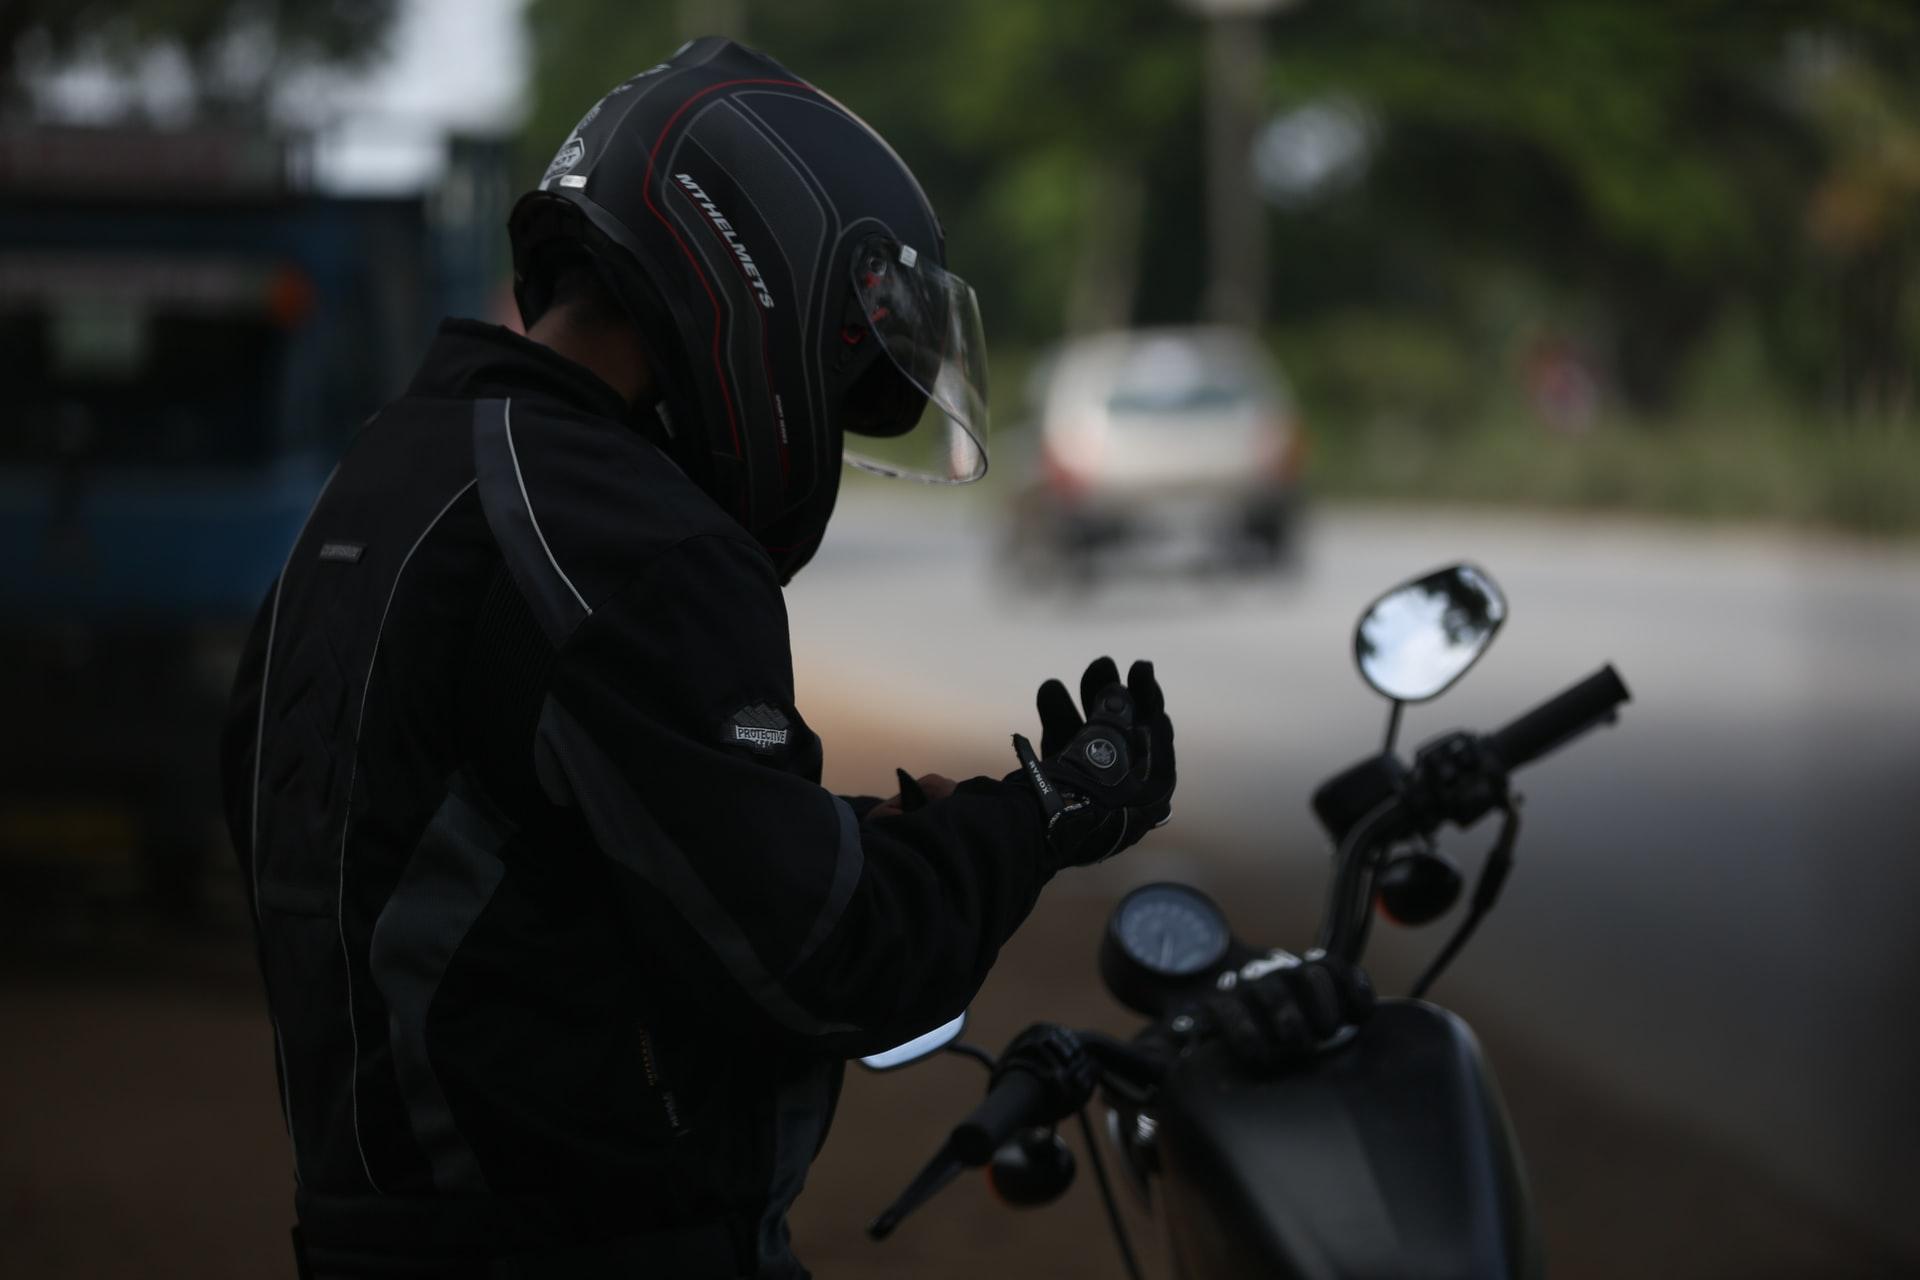 ciclista con guantes